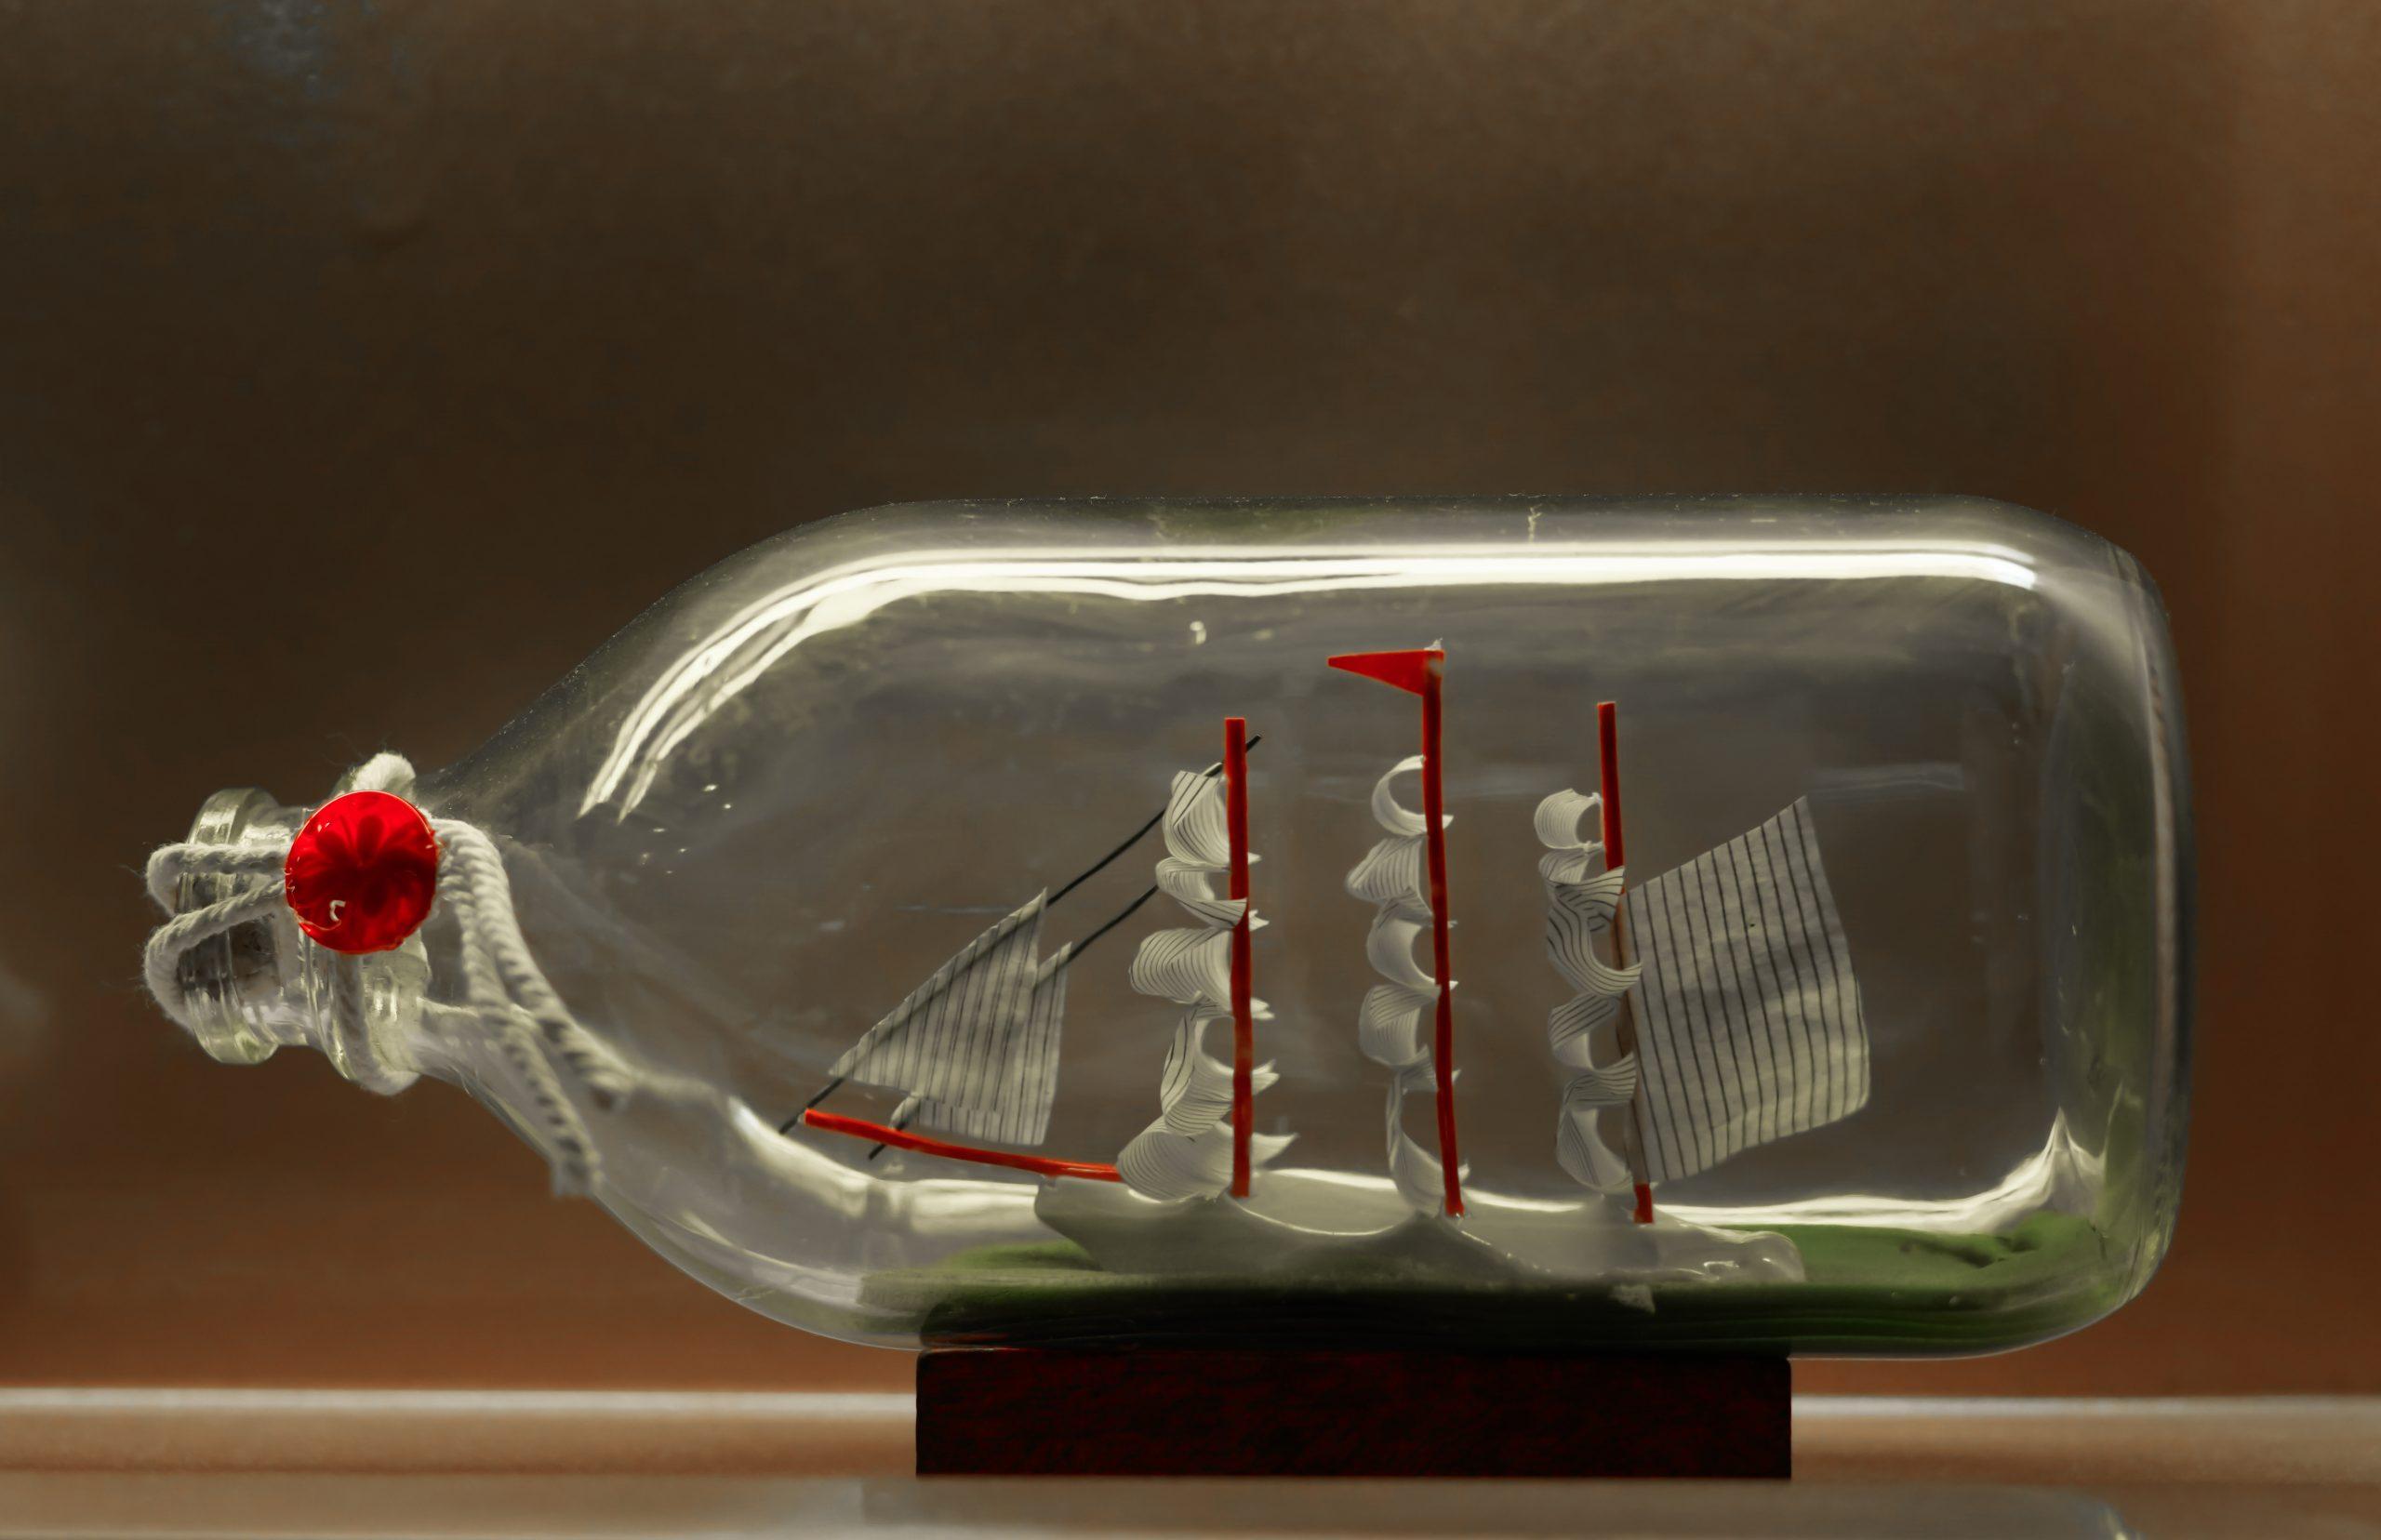 A replica of a ship inside a bottle